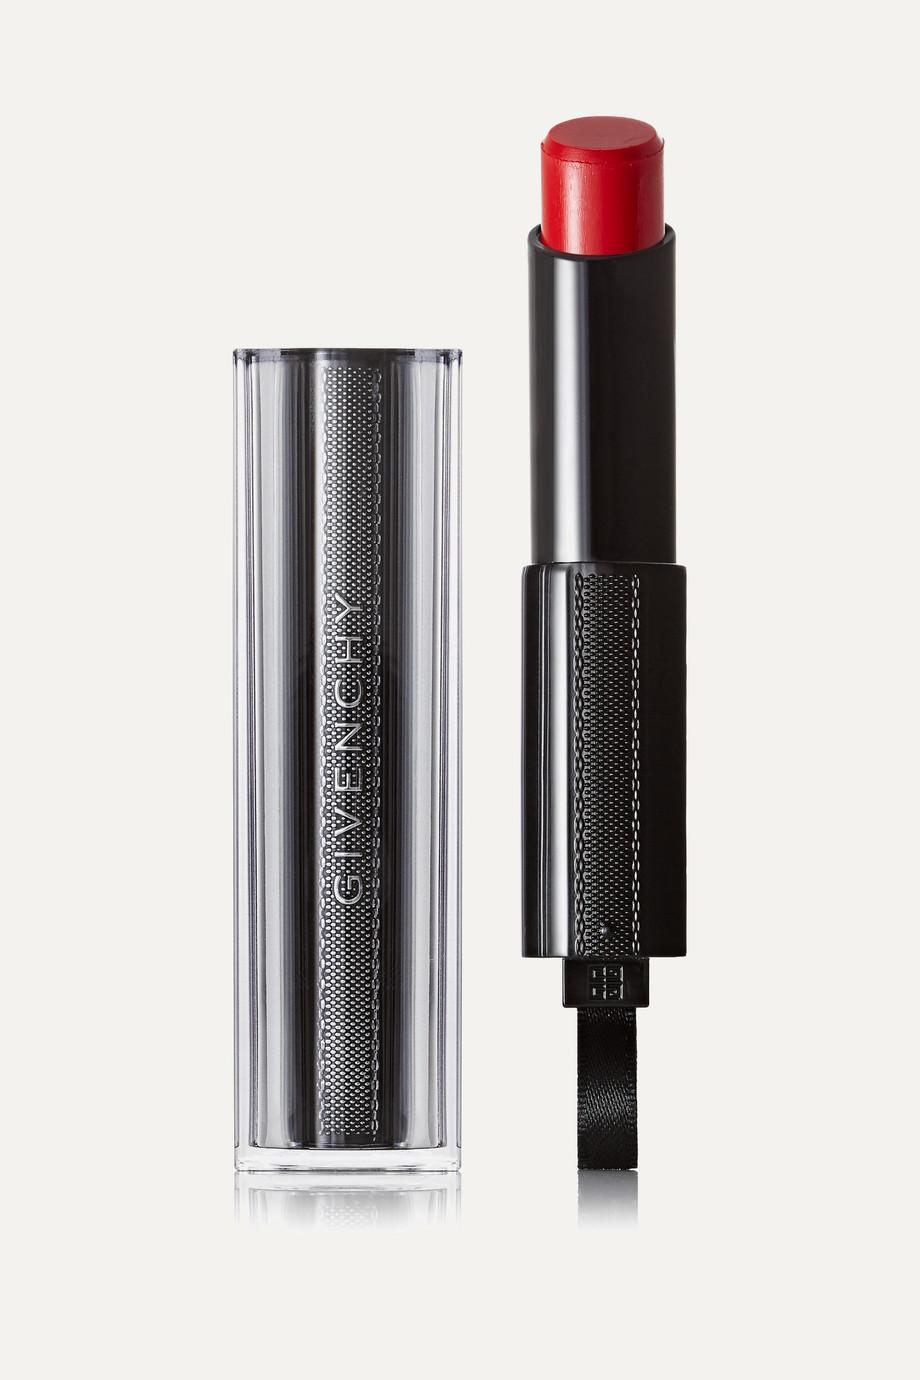 Rouge Interdit Vinyl Lipstick - Rose Tentateur No. 04, by Givenchy Beauty